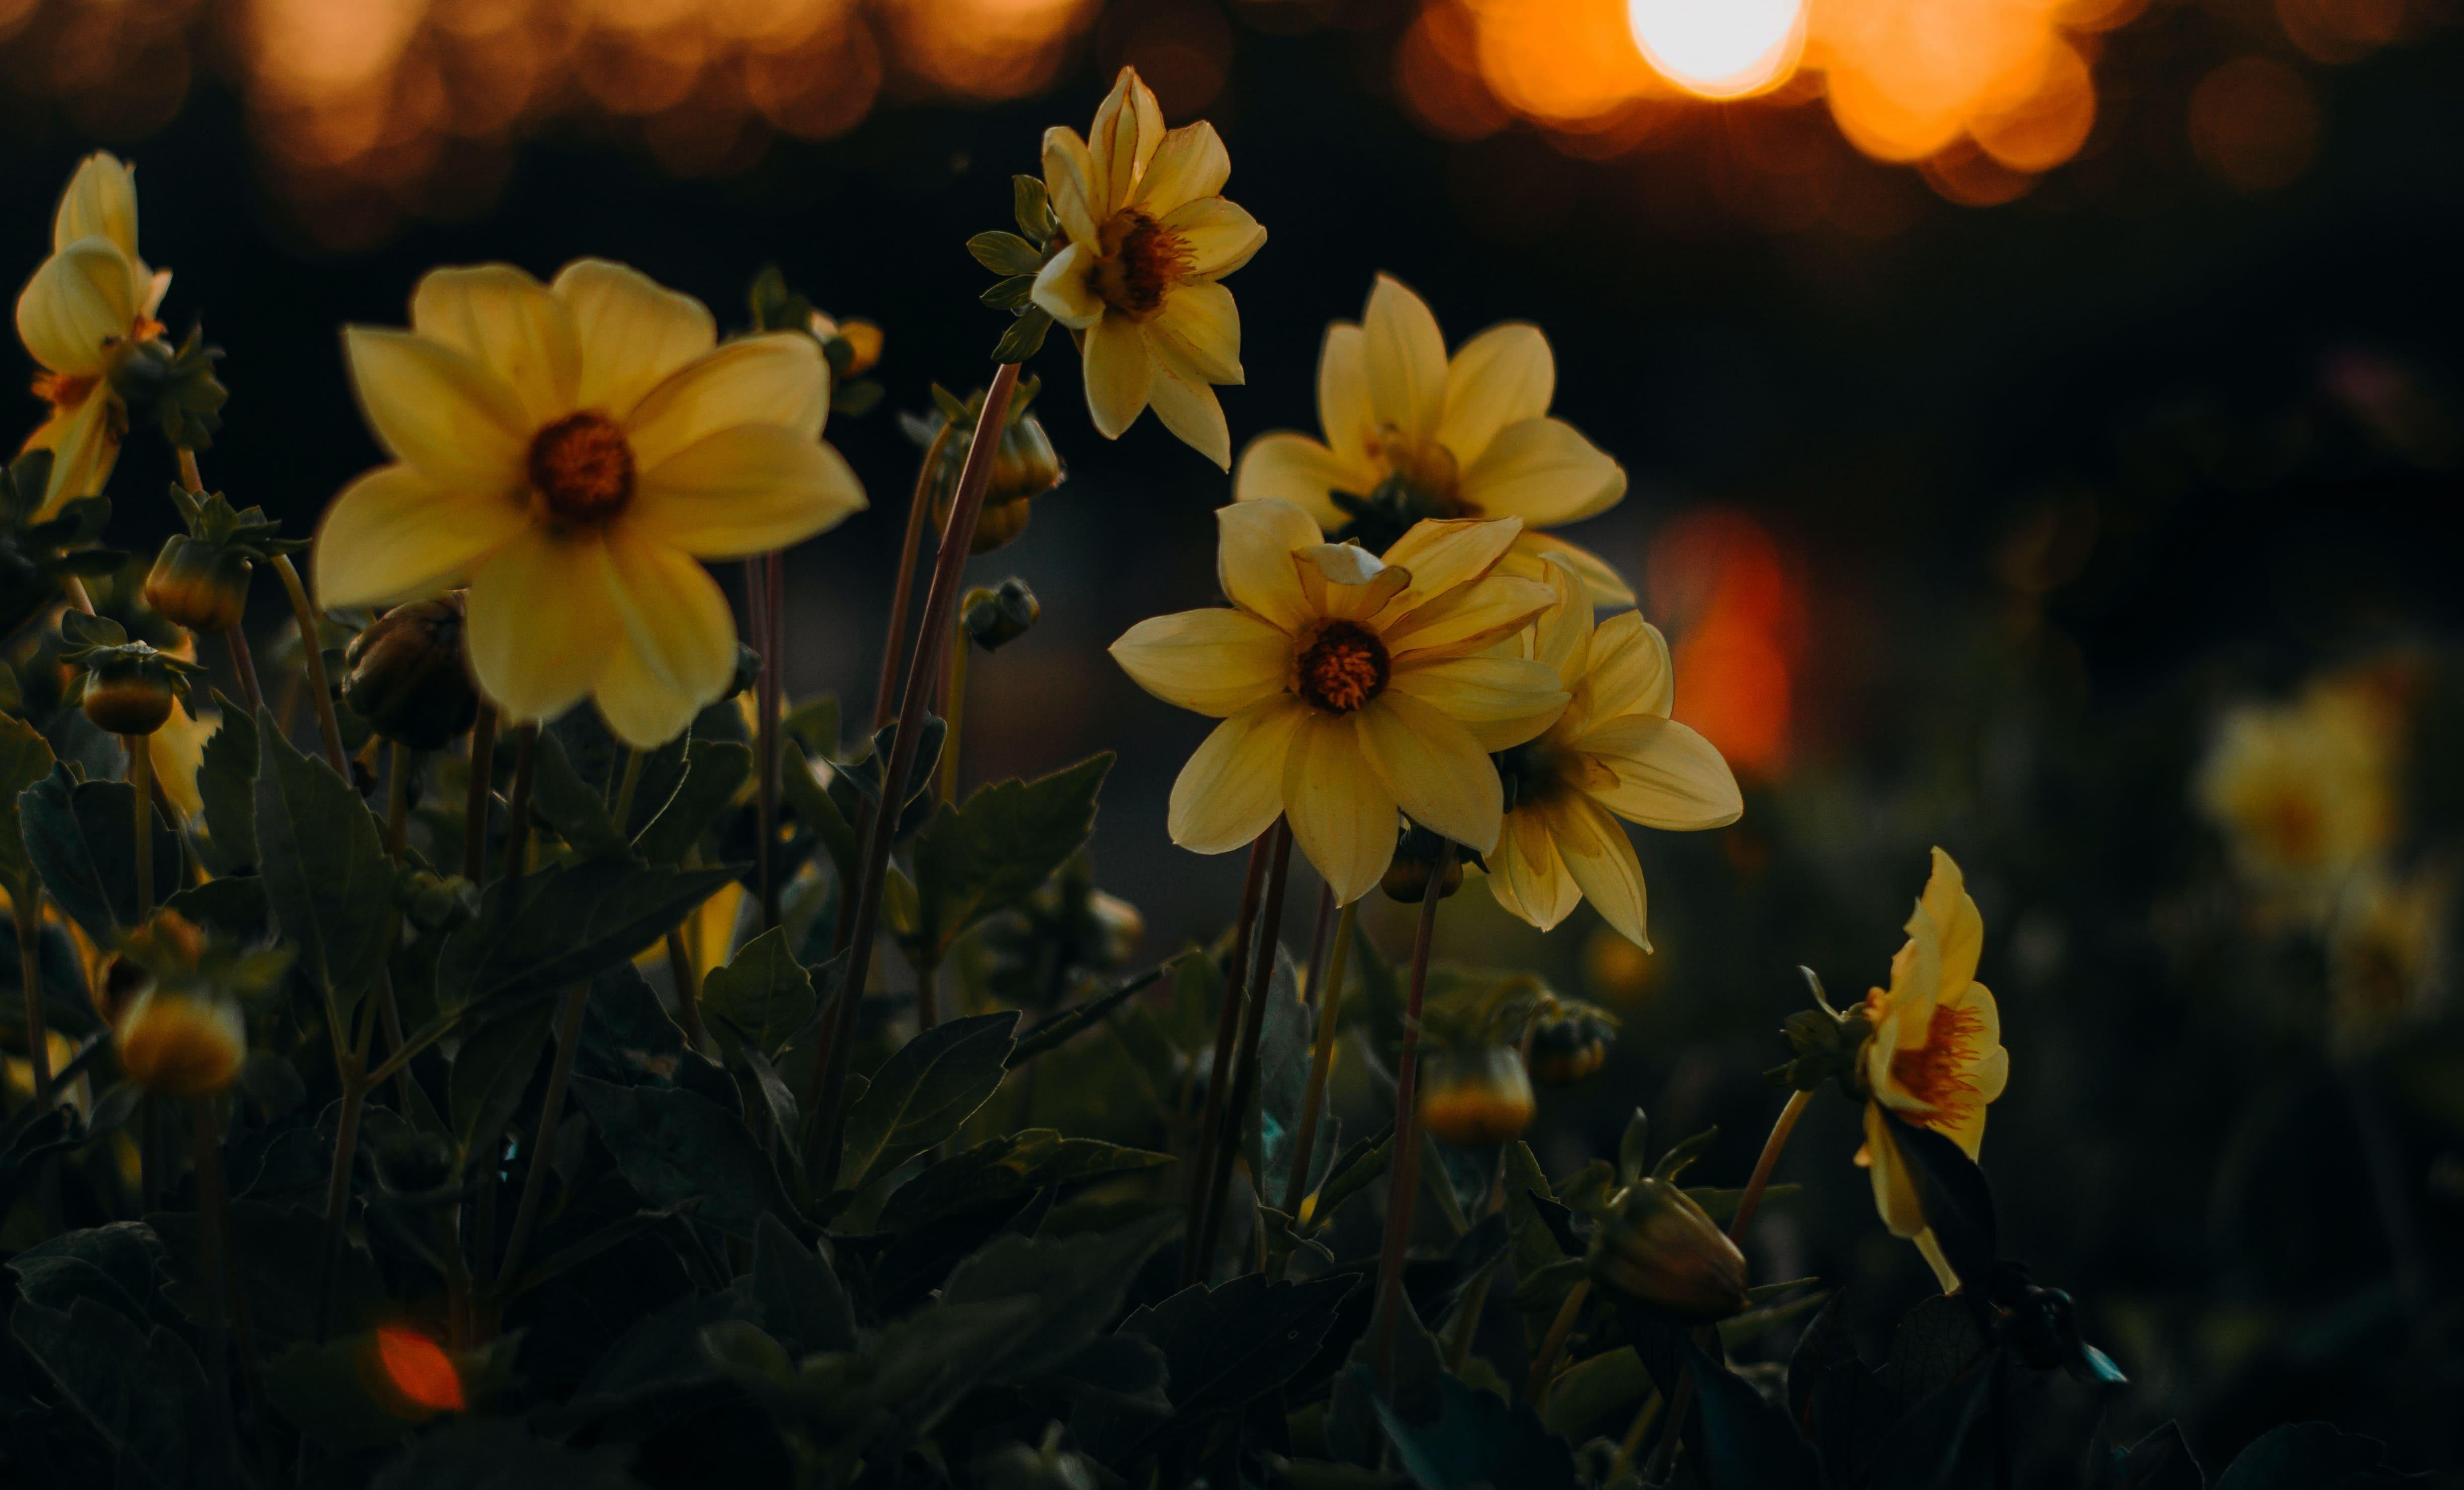 daffodils-photo-94